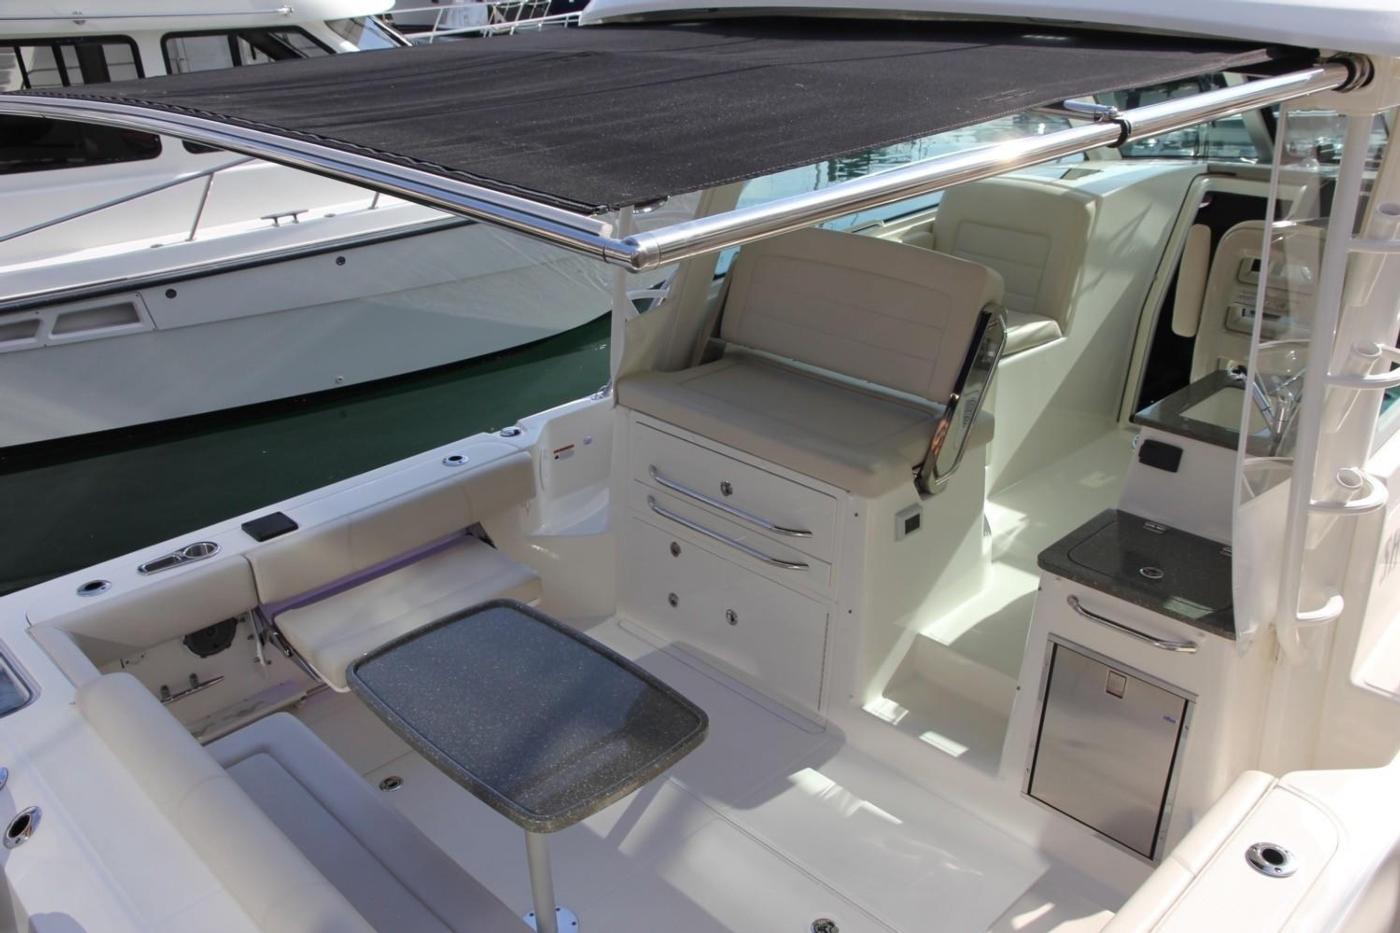 2017 Boston Whaler 345 Conquest, Retractable Cockpit Shade